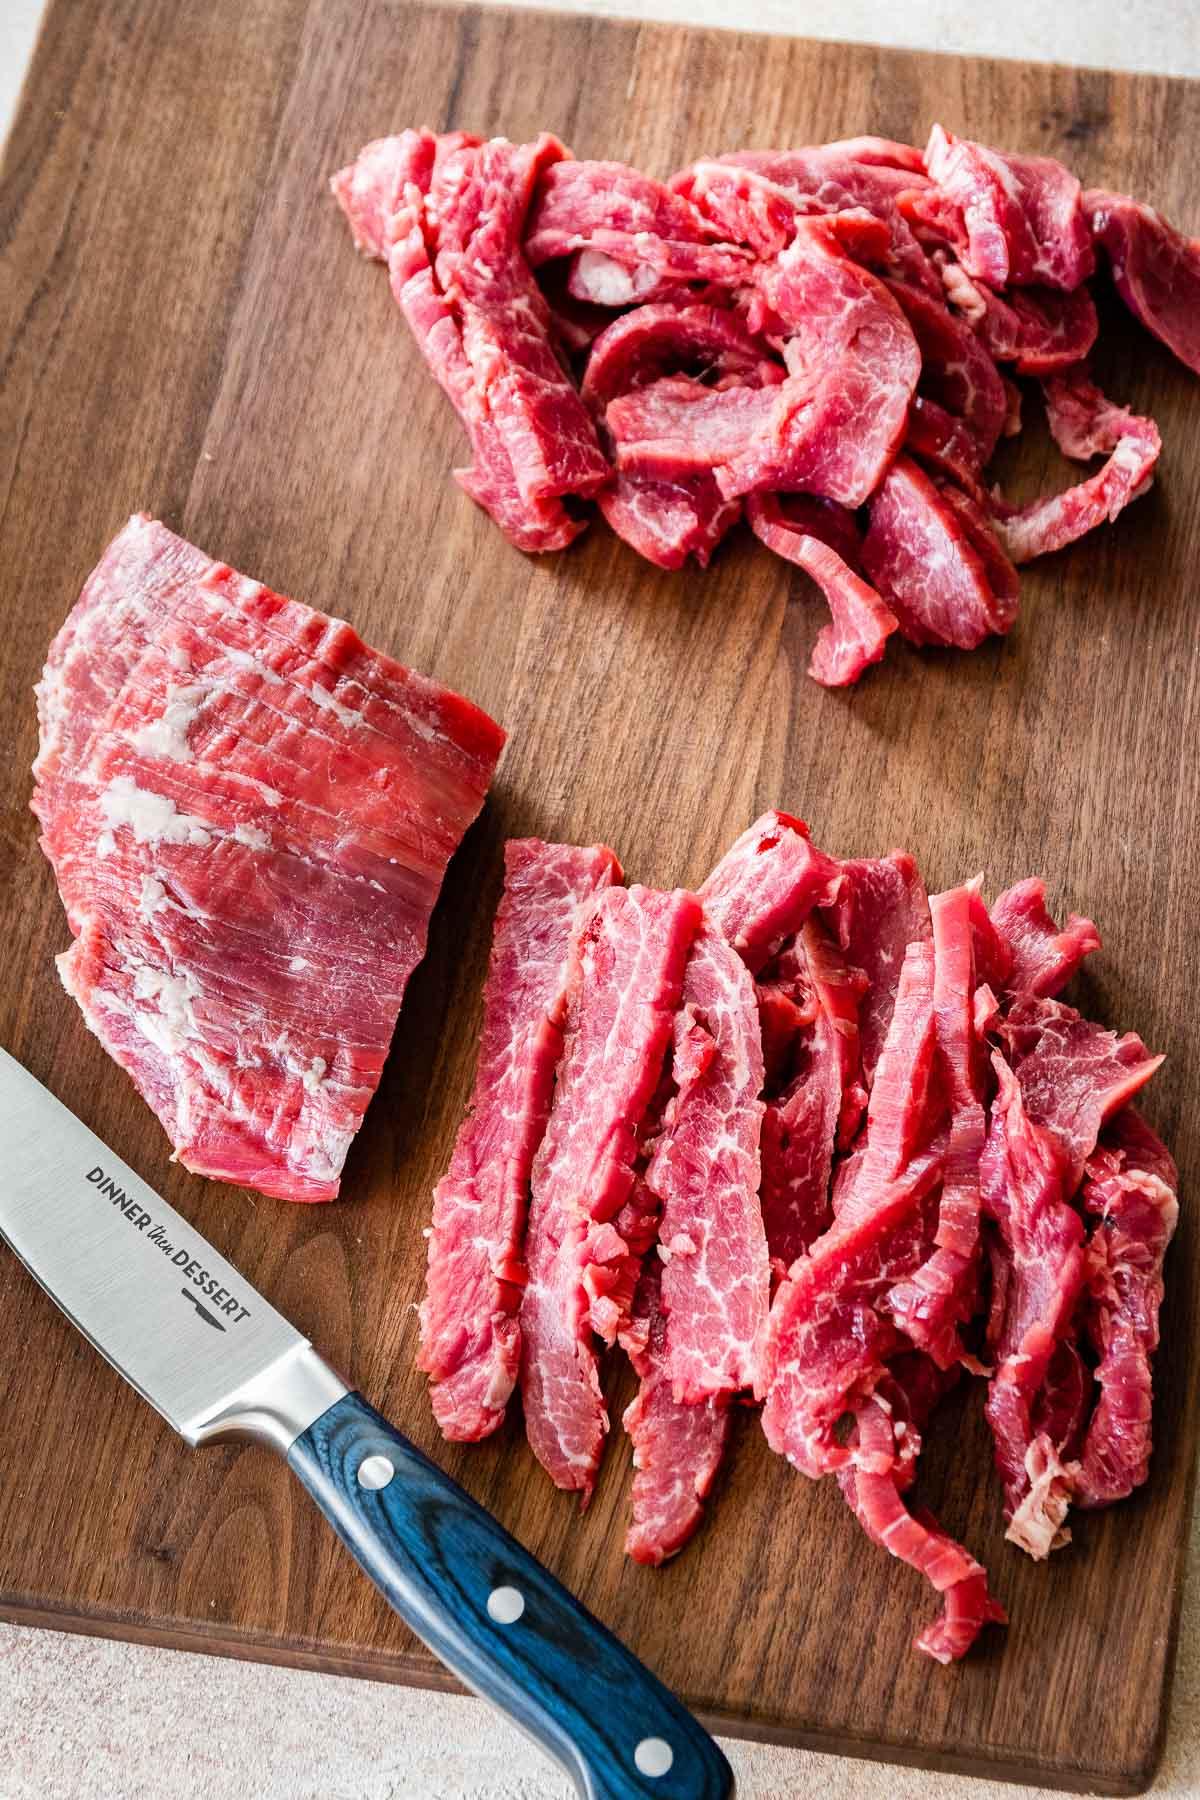 Easy Pepper Steak sliced flank steak on board